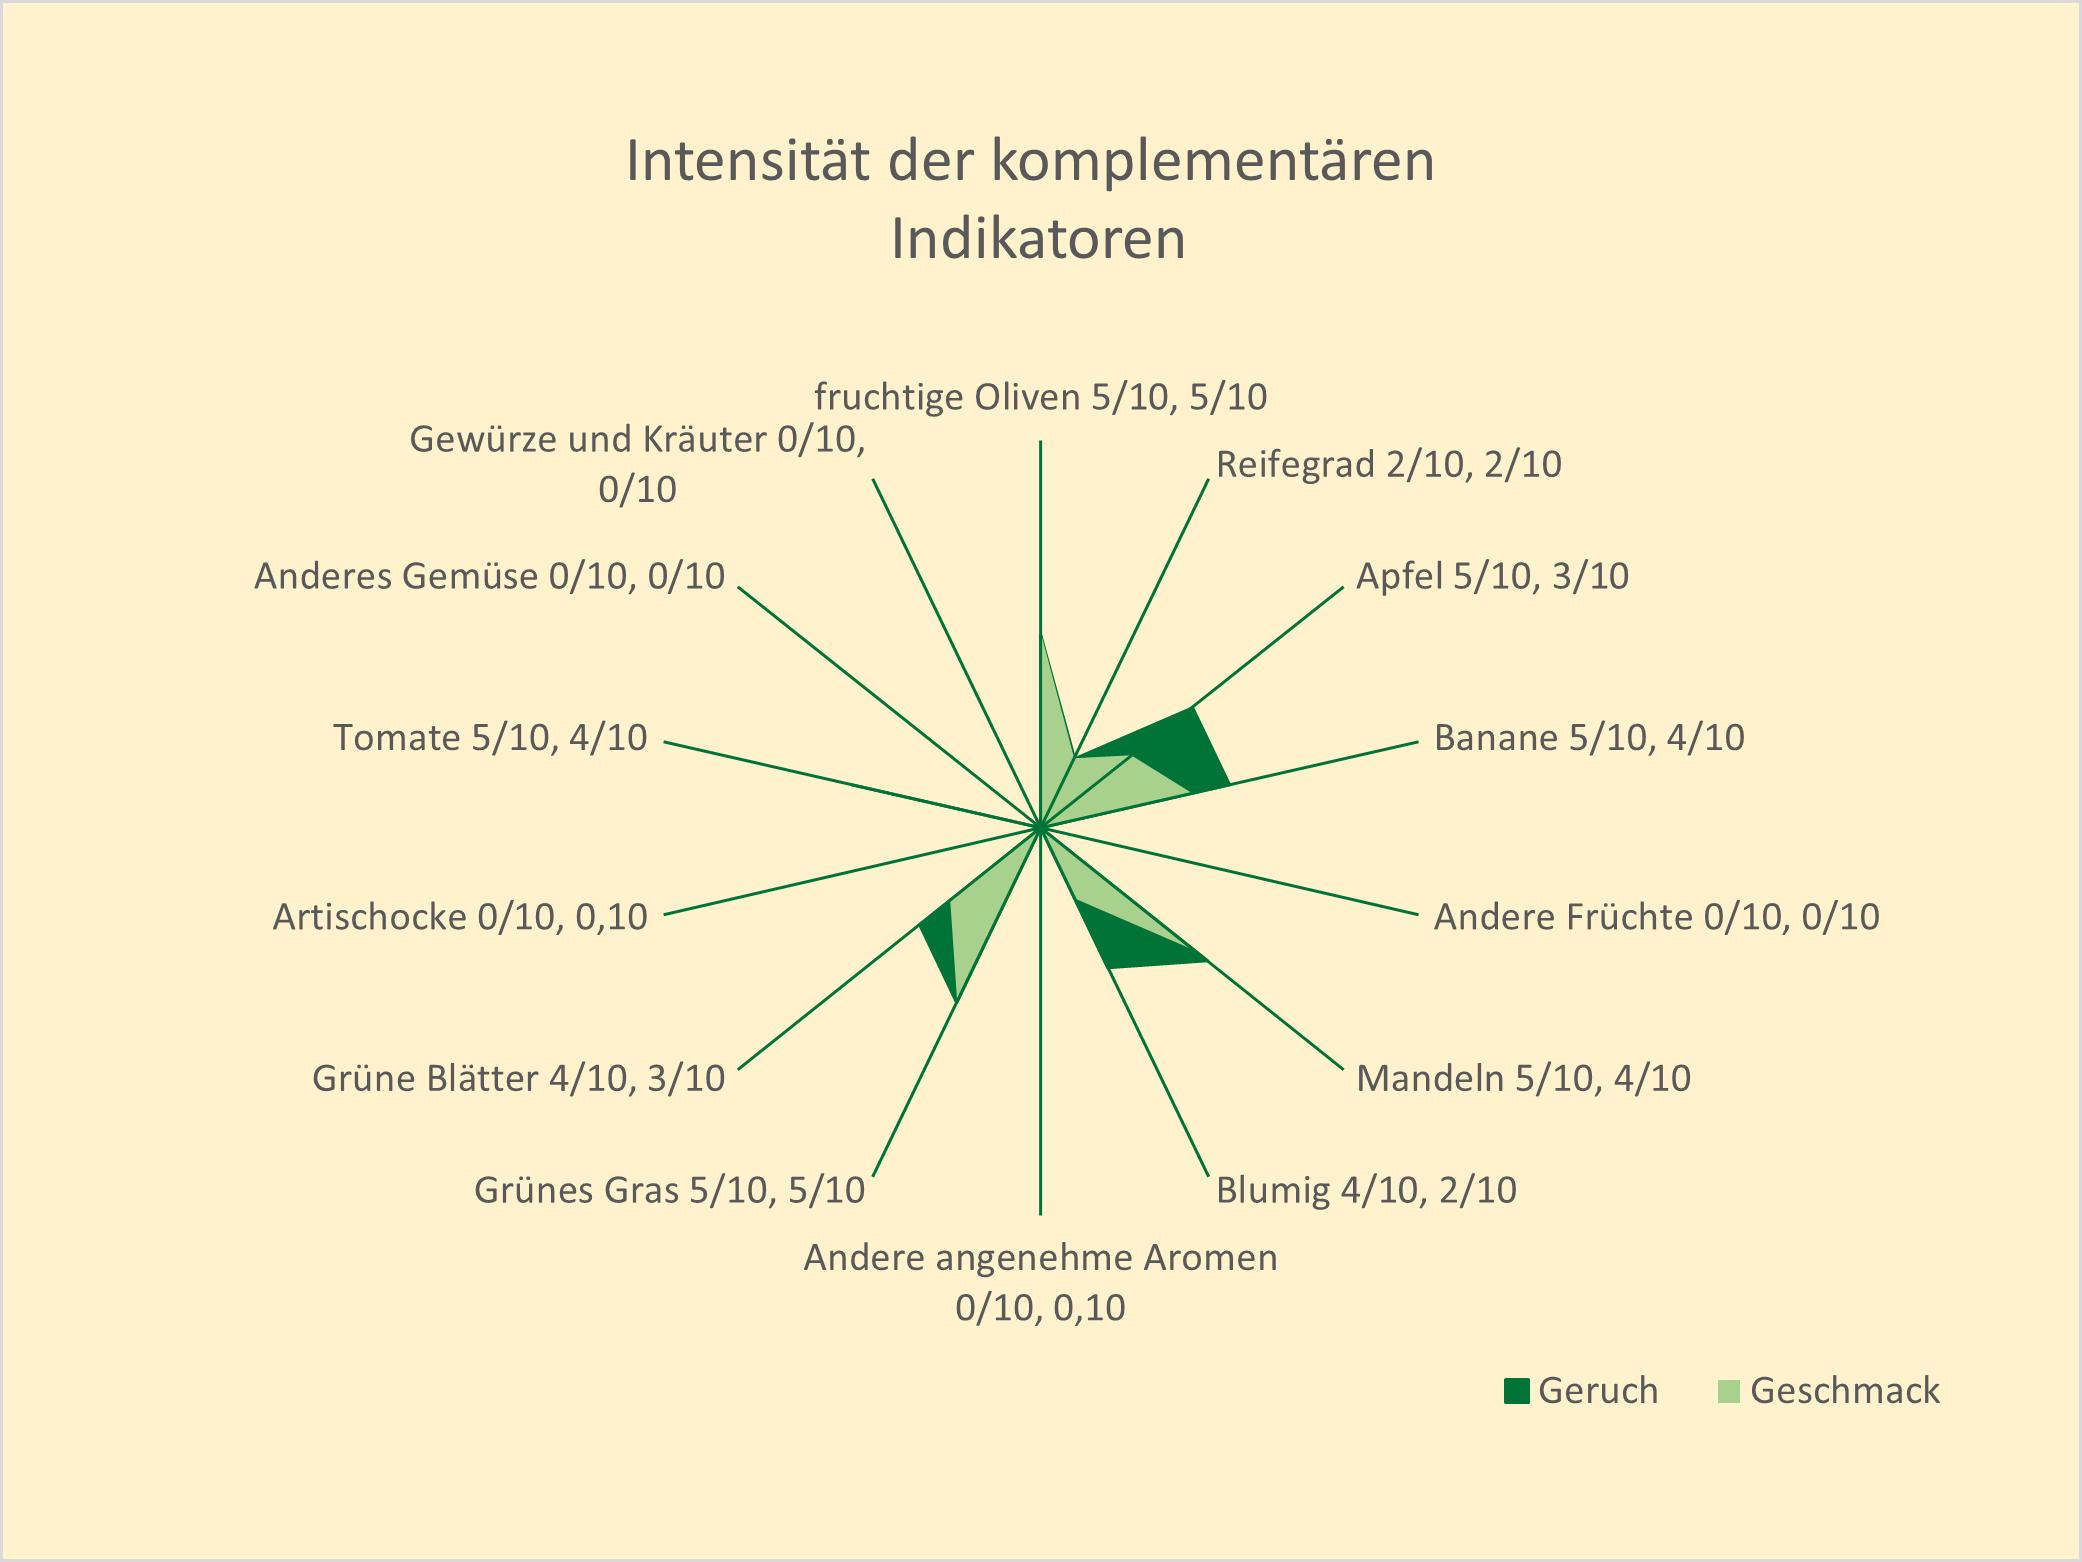 Intensität der komplementären Indikatoren Olivenöl Arbequina